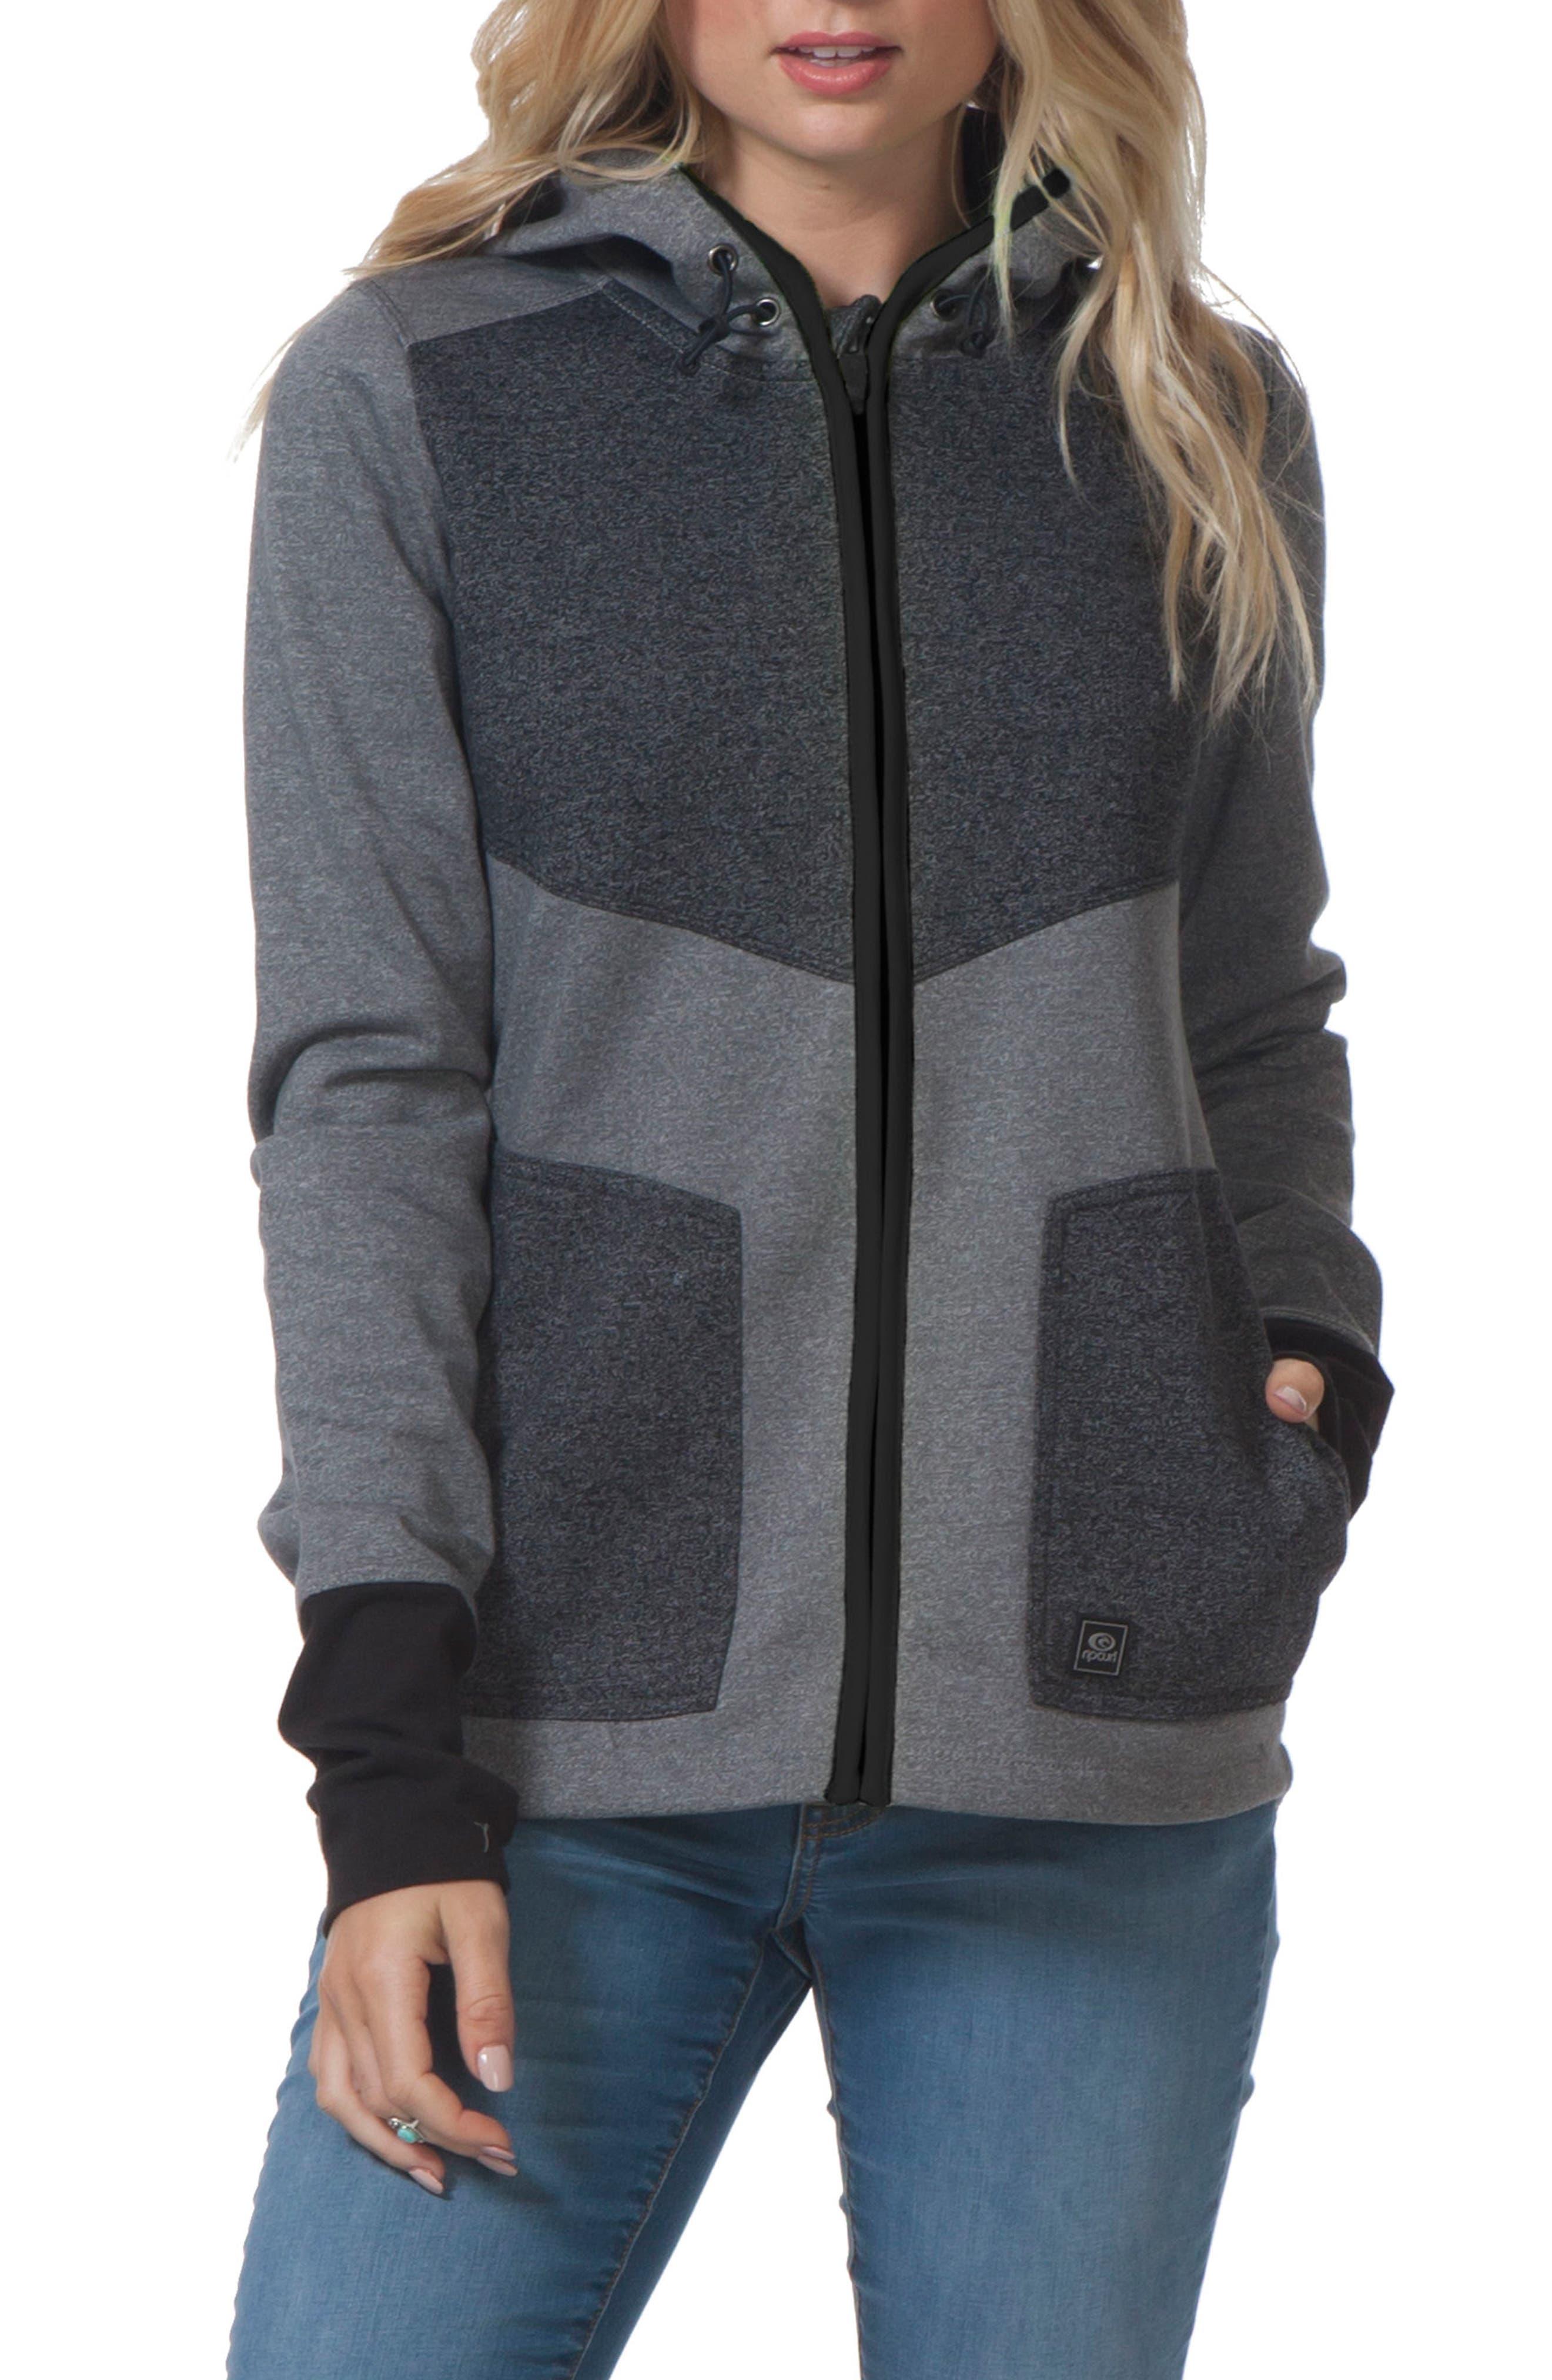 Espy Anti Series Hooded Jacket,                         Main,                         color, 020